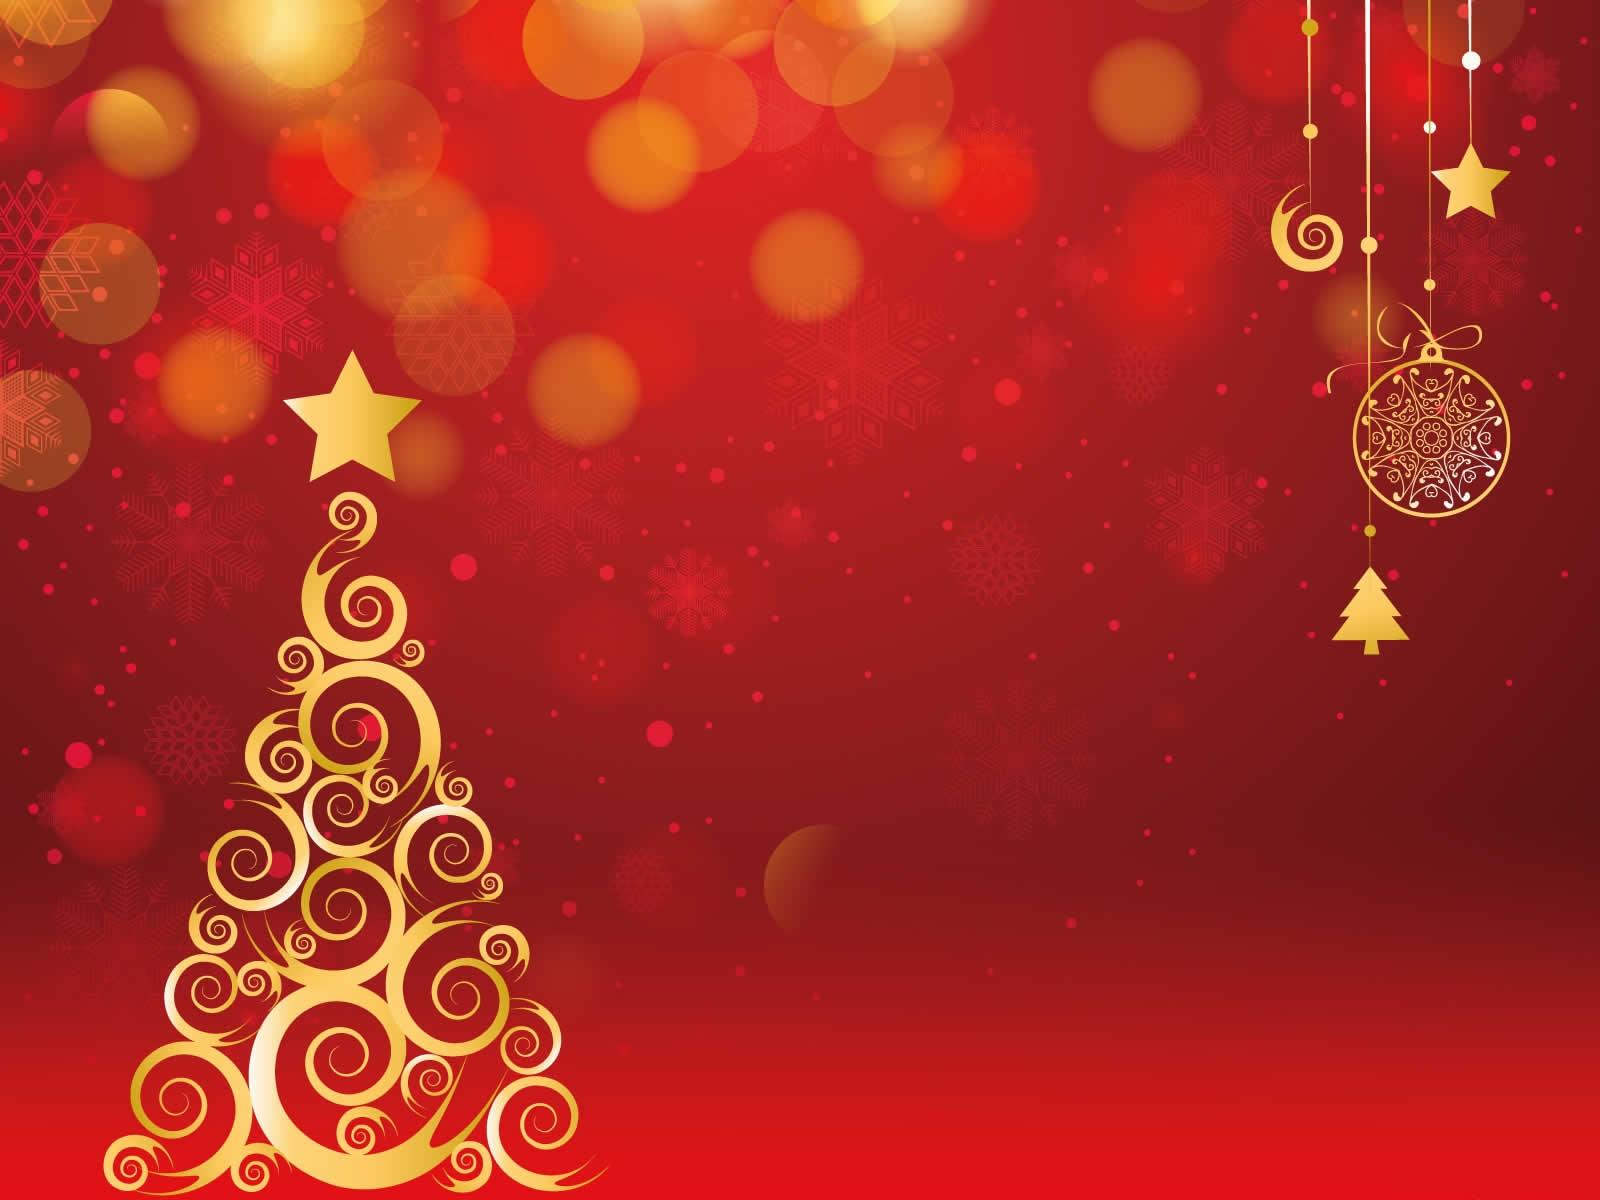 Immagini Natale Per Desktop.Immagini Natalizie Sfondi Natalizi Per Un Desktop Di Natale